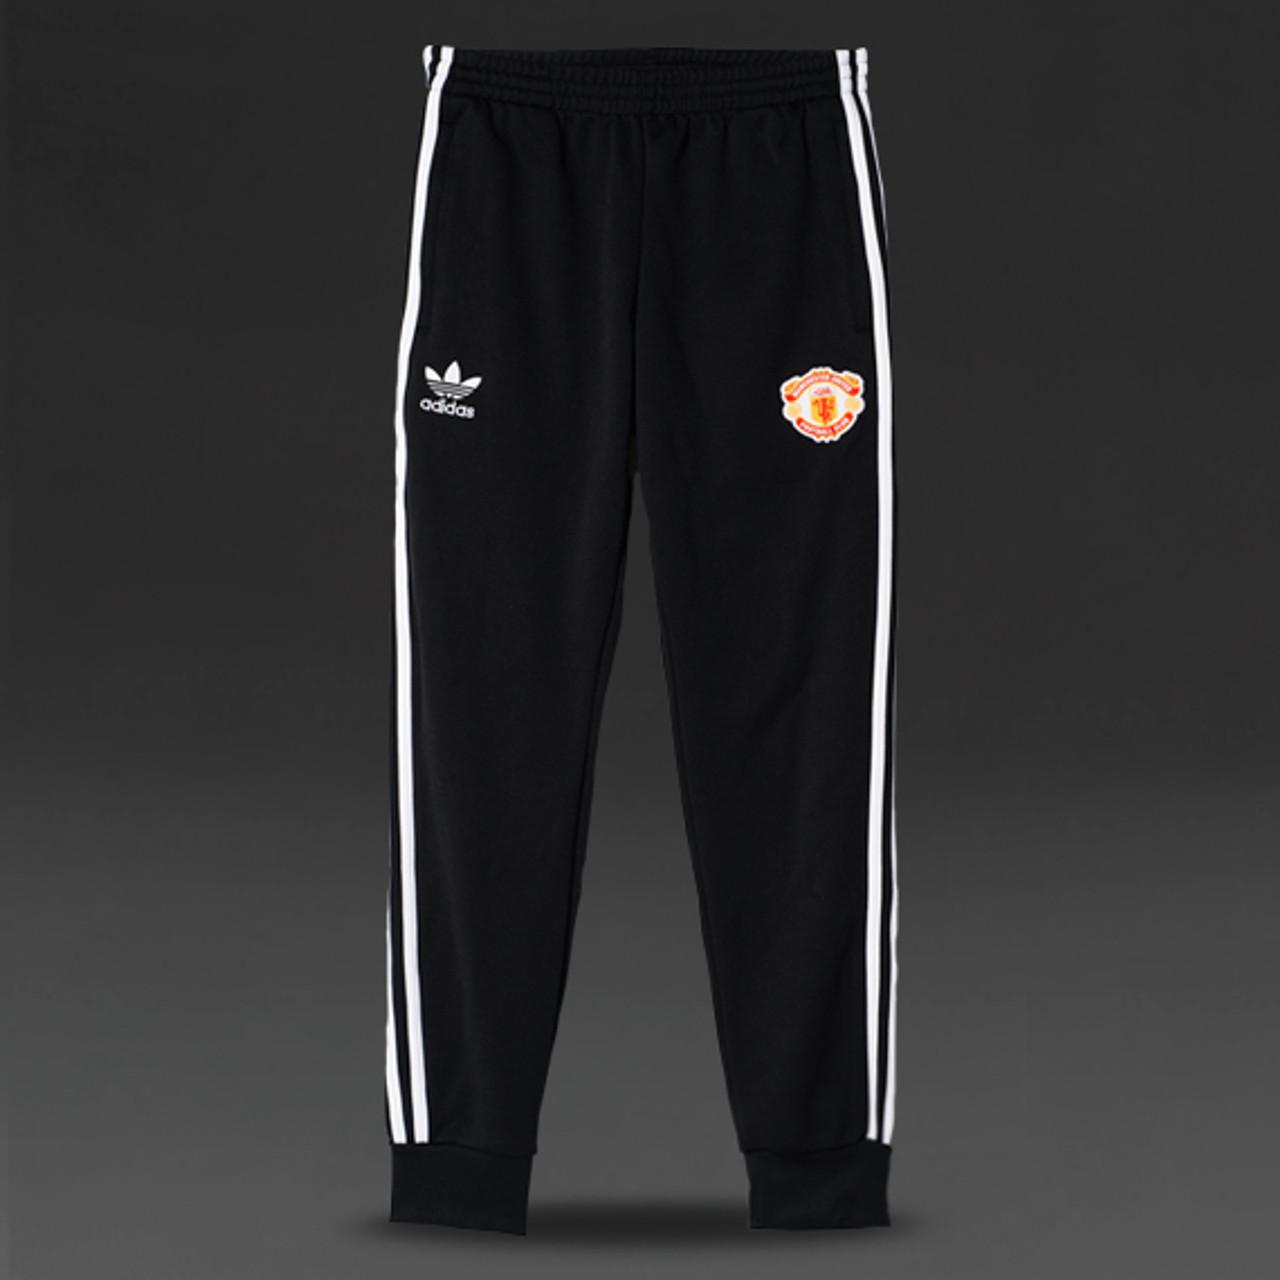 Adidas Originals Manchester United 2018 Pants